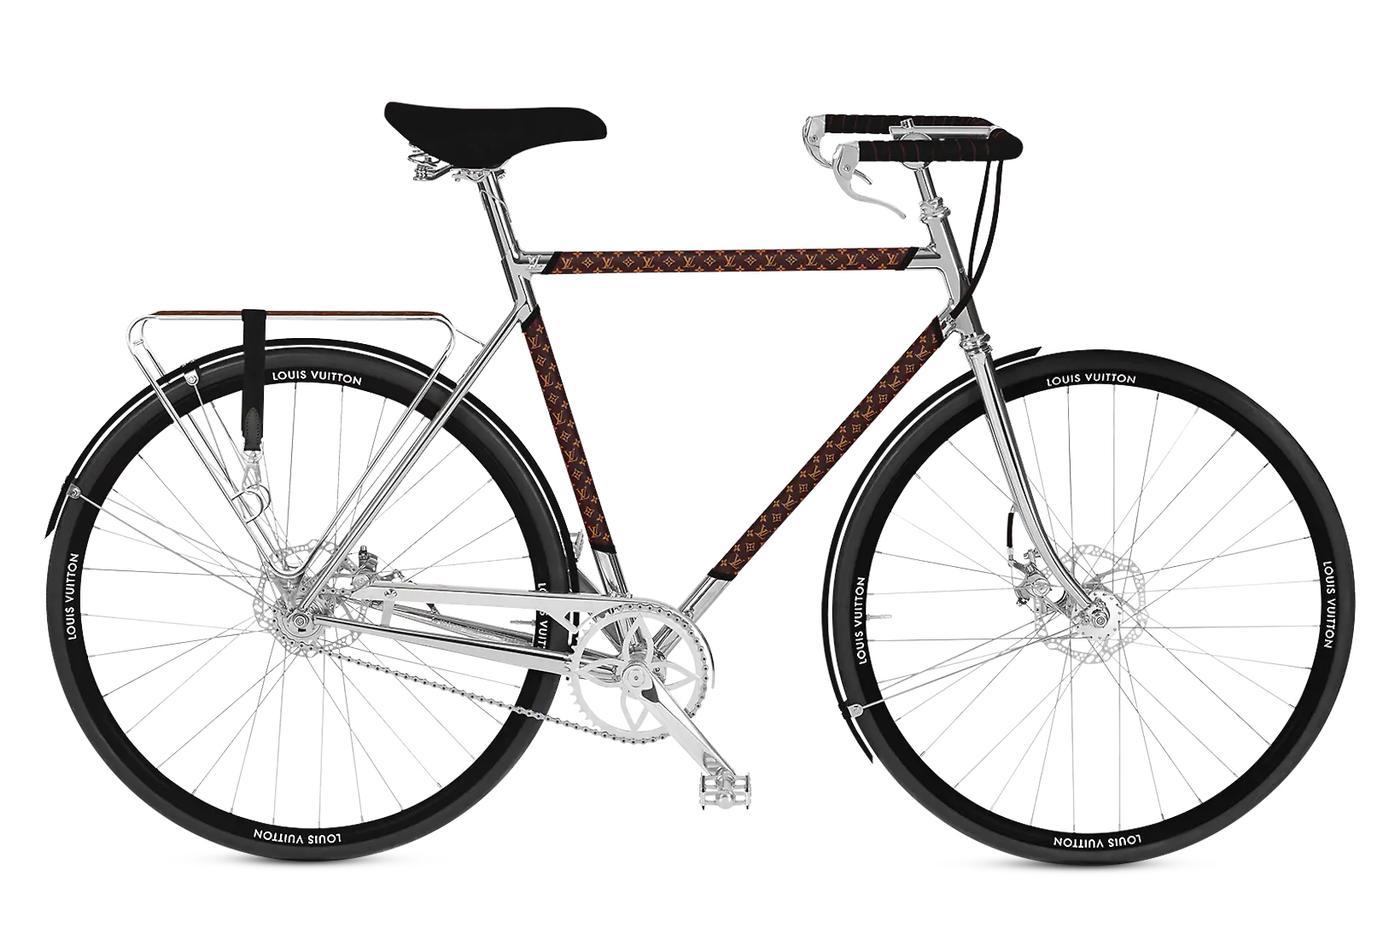 Behold the $28,900.00 Louis Vuitton by Maison Tamboite City Bike